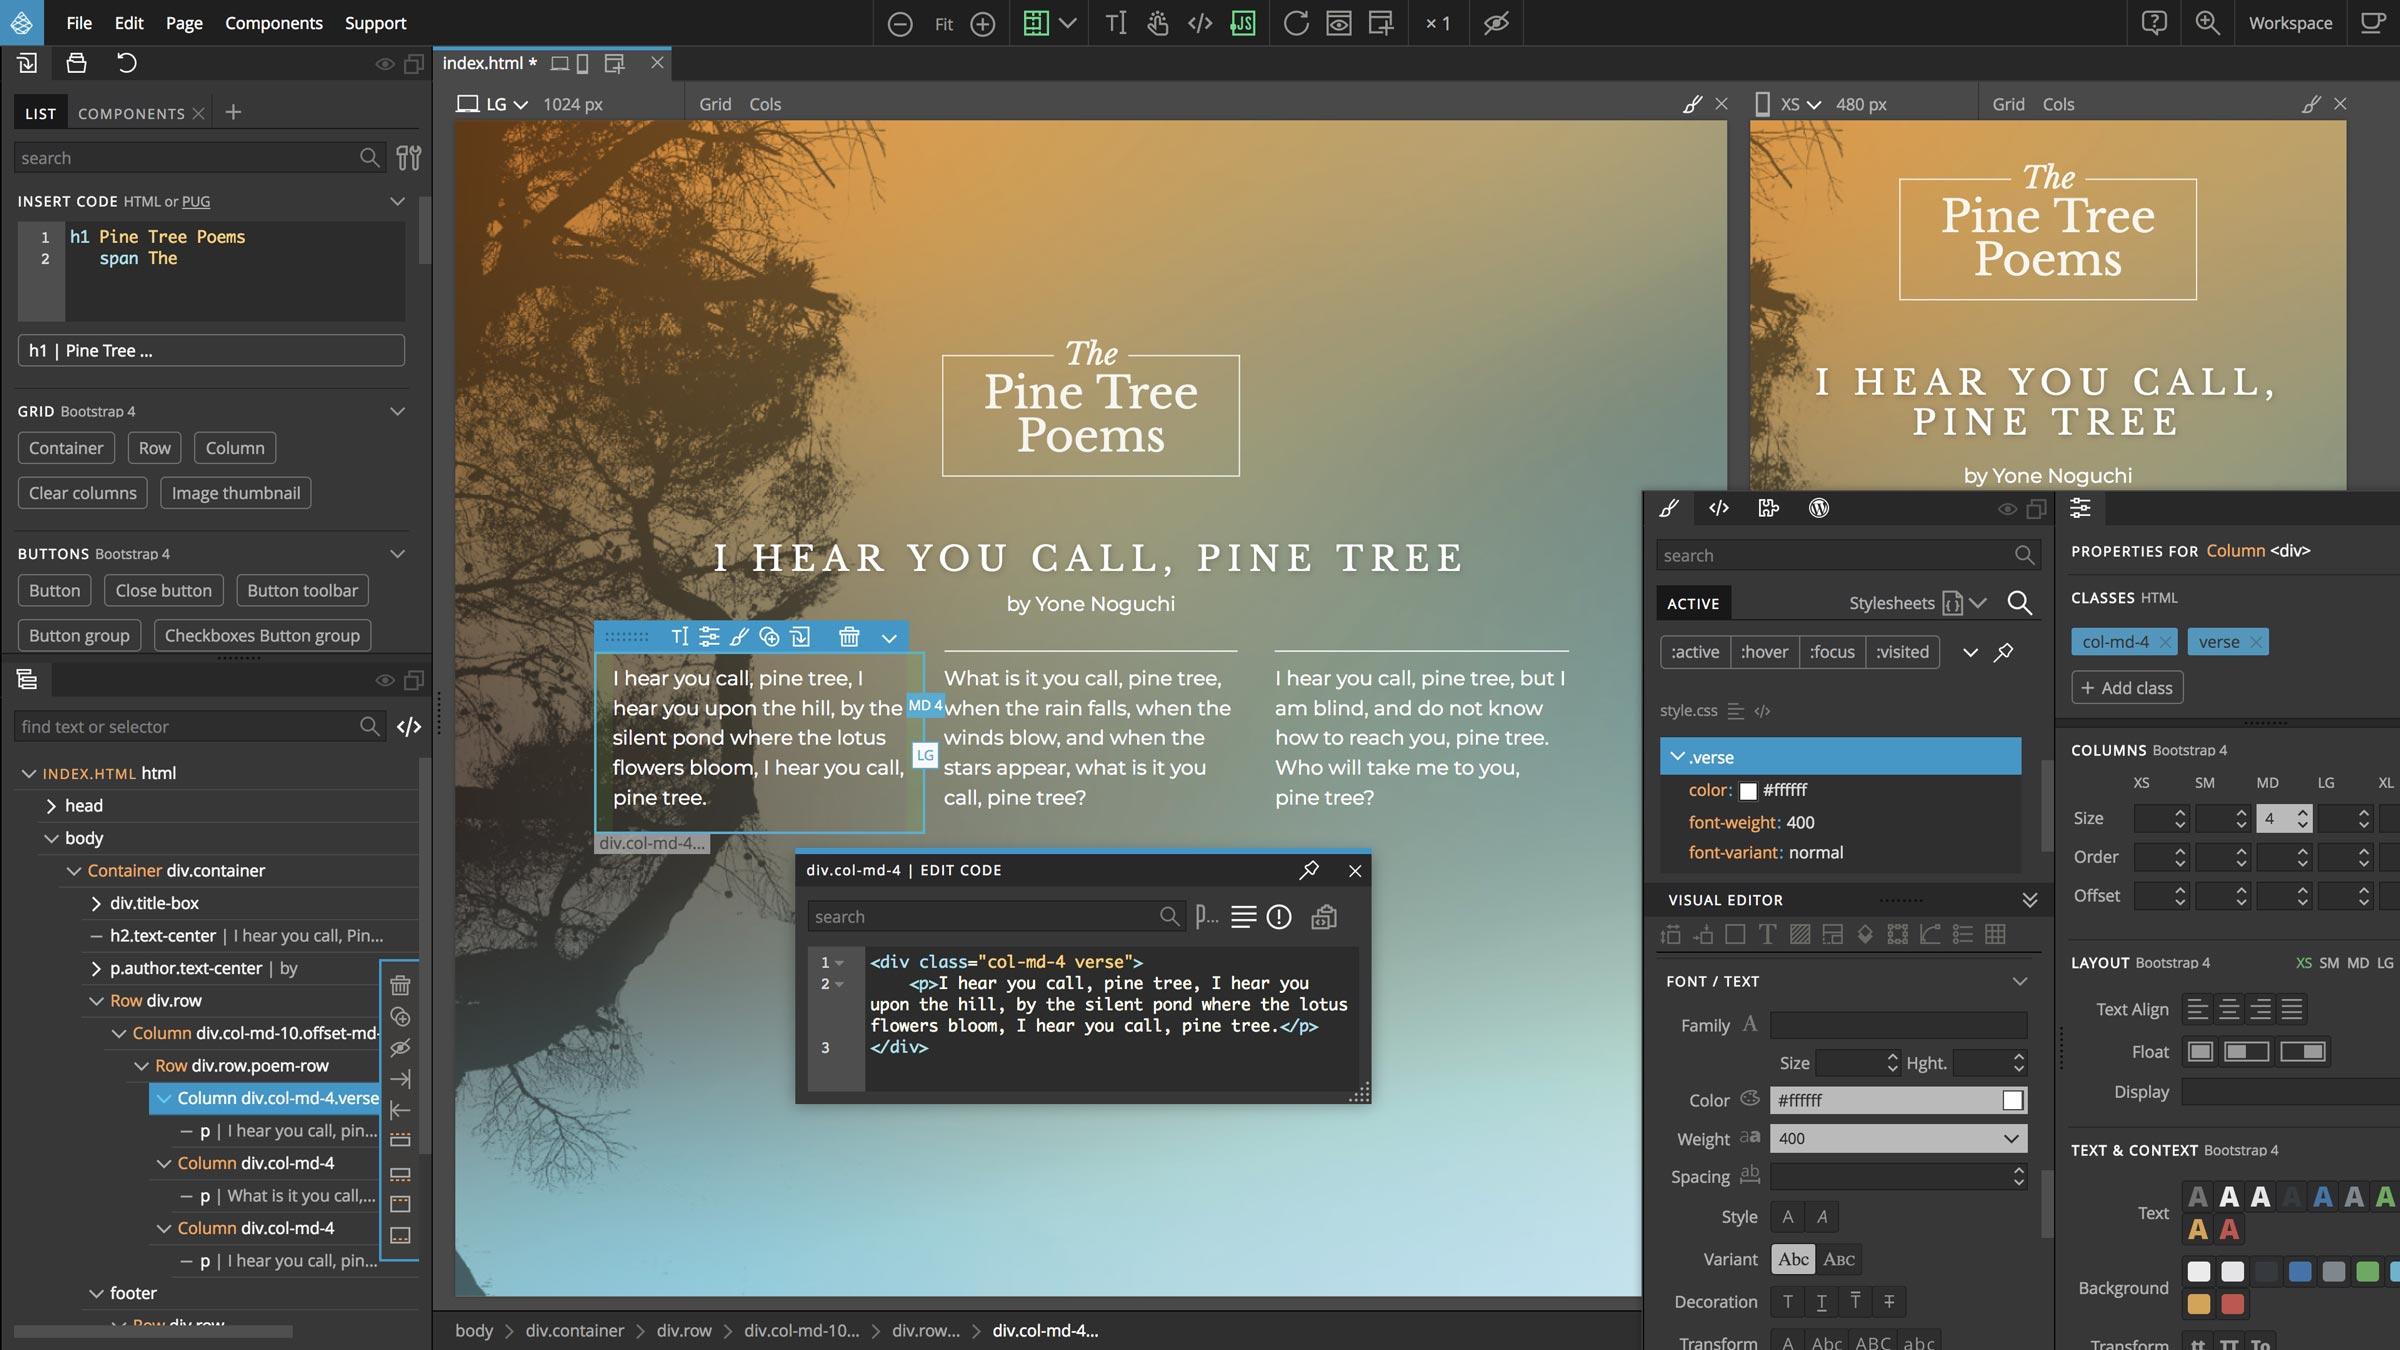 Humane Technologies Pinegrow Web Editor 4.91